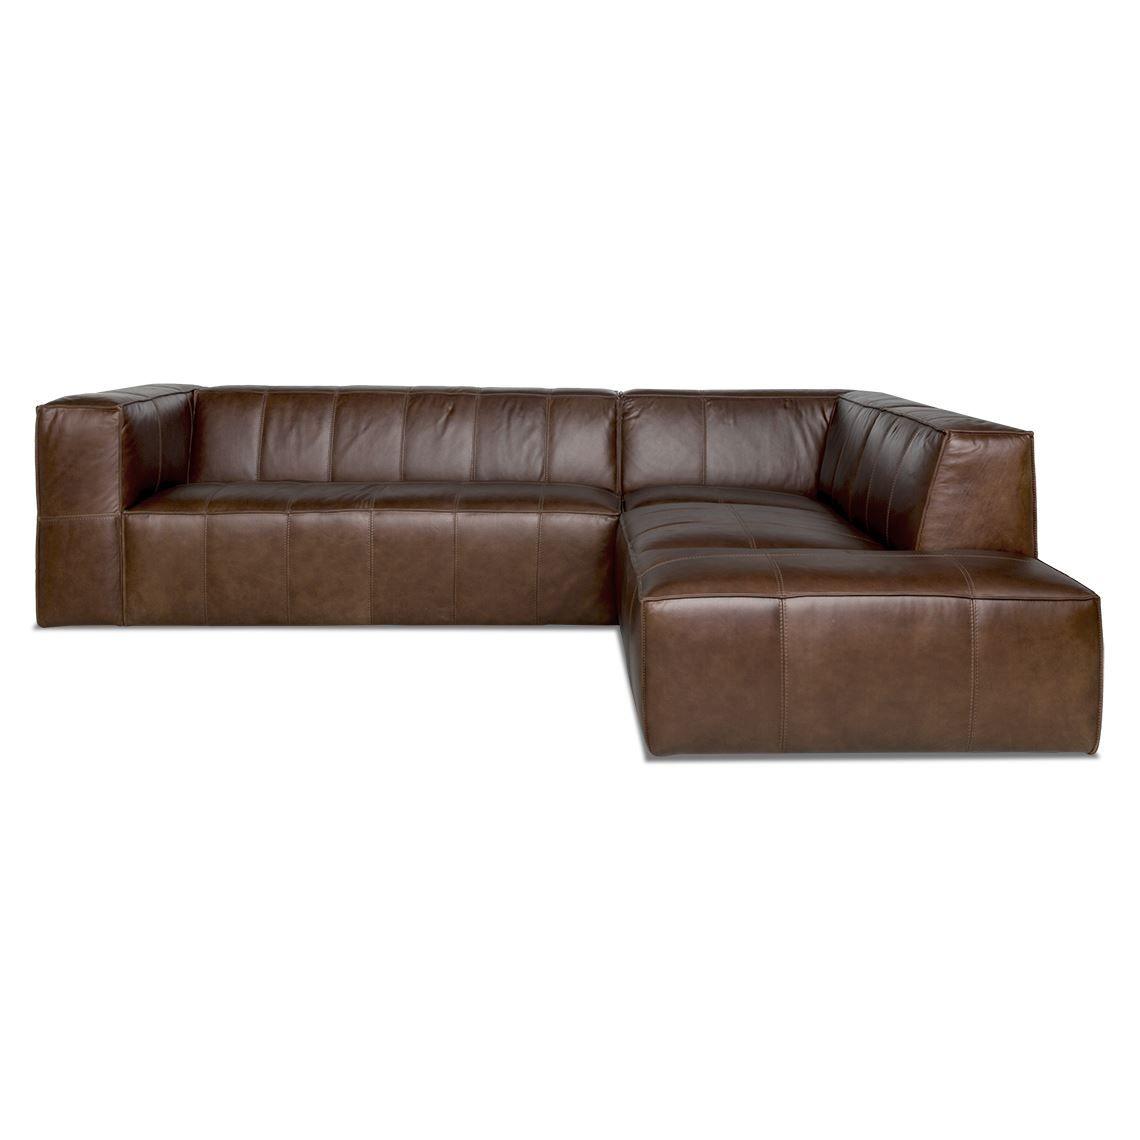 ATLAS 4 Seat Leather Corner Modular Sofa With Right Terminal ...